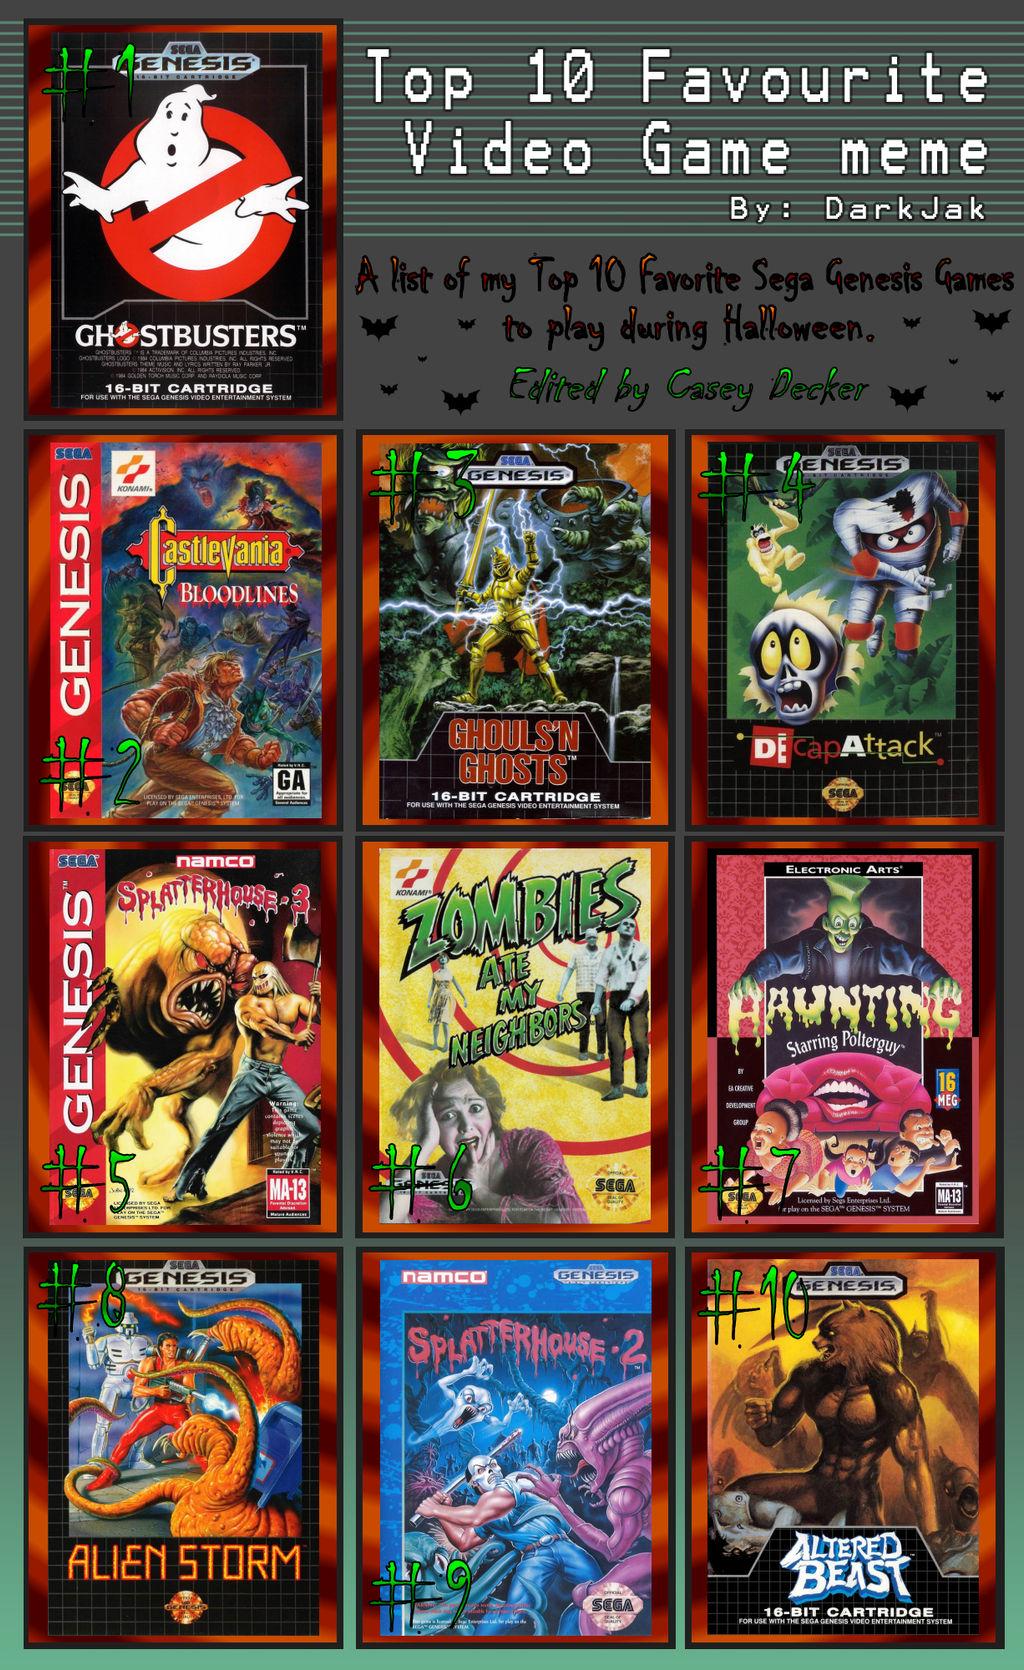 Sega genesis game show games spider man games 1 2 3